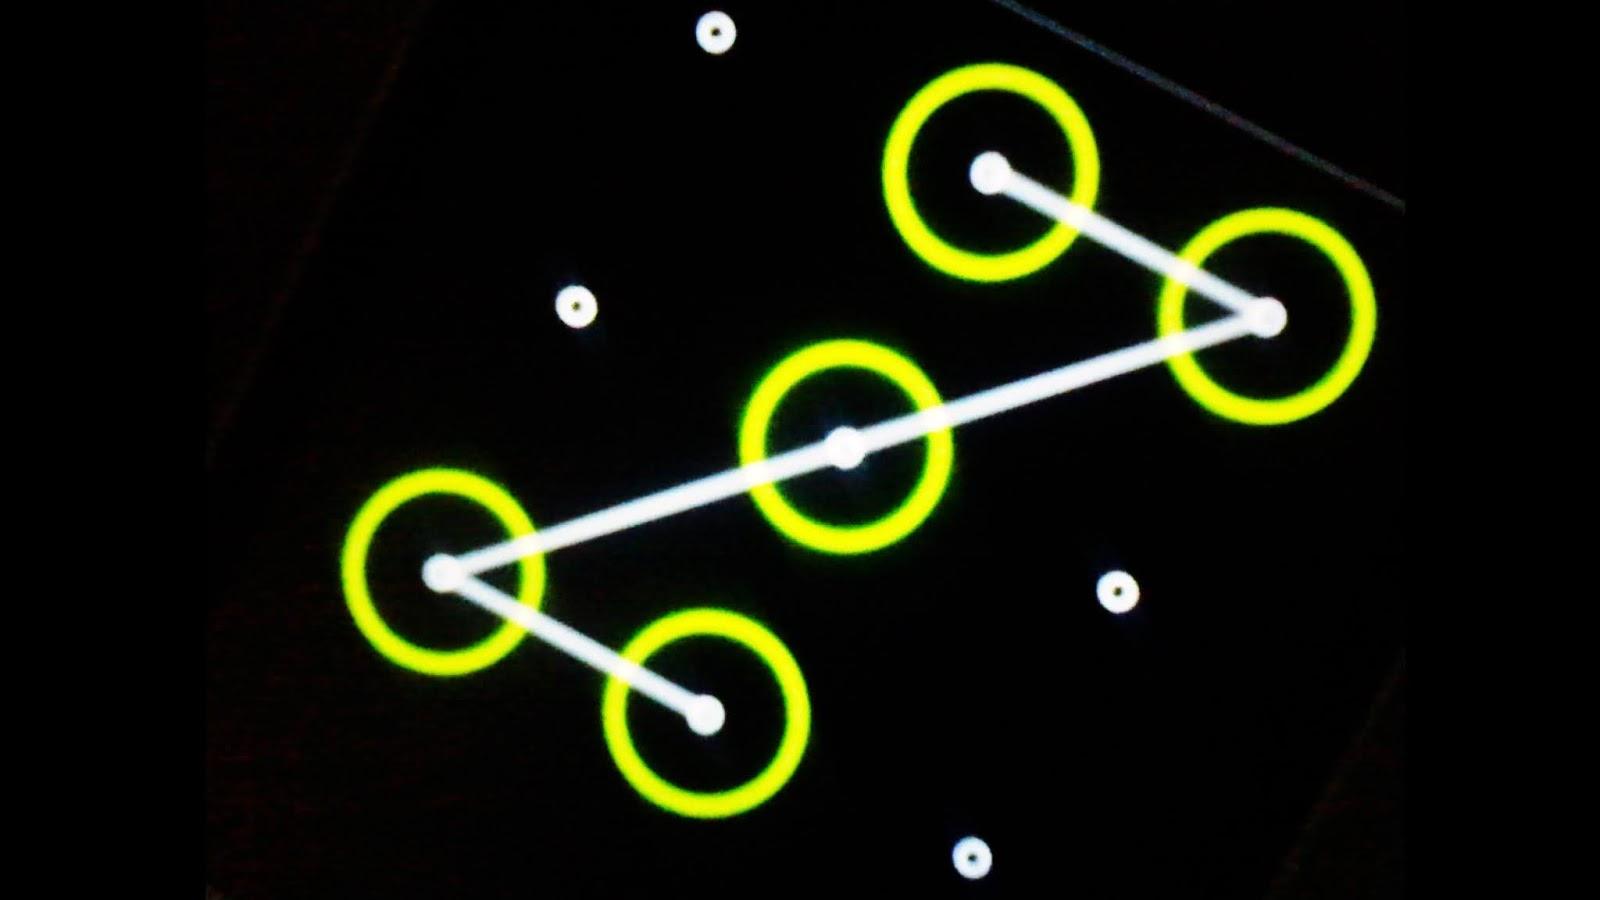 Panduan Lengkap Cara Mengatasi Lupa Pola Android